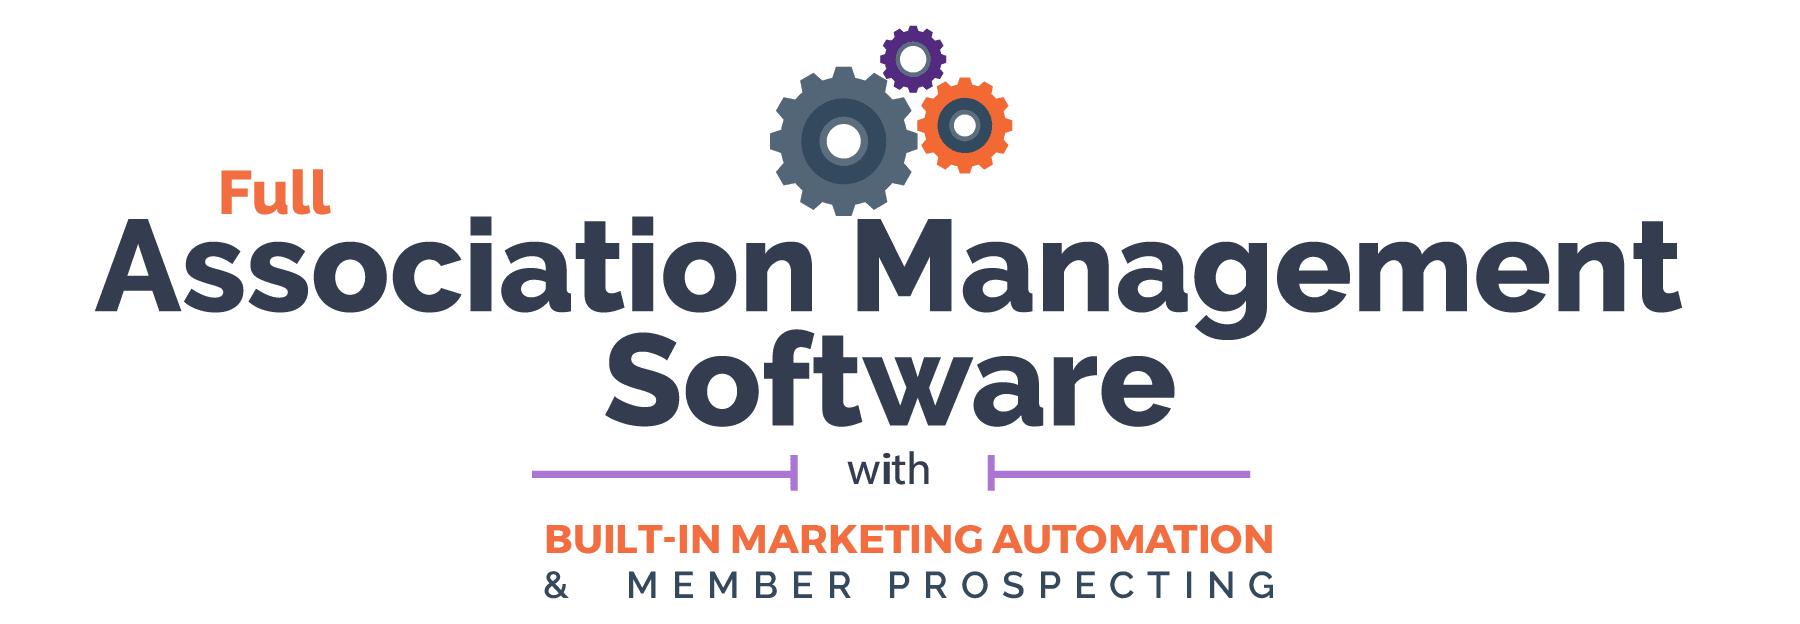 Full Association Management Software